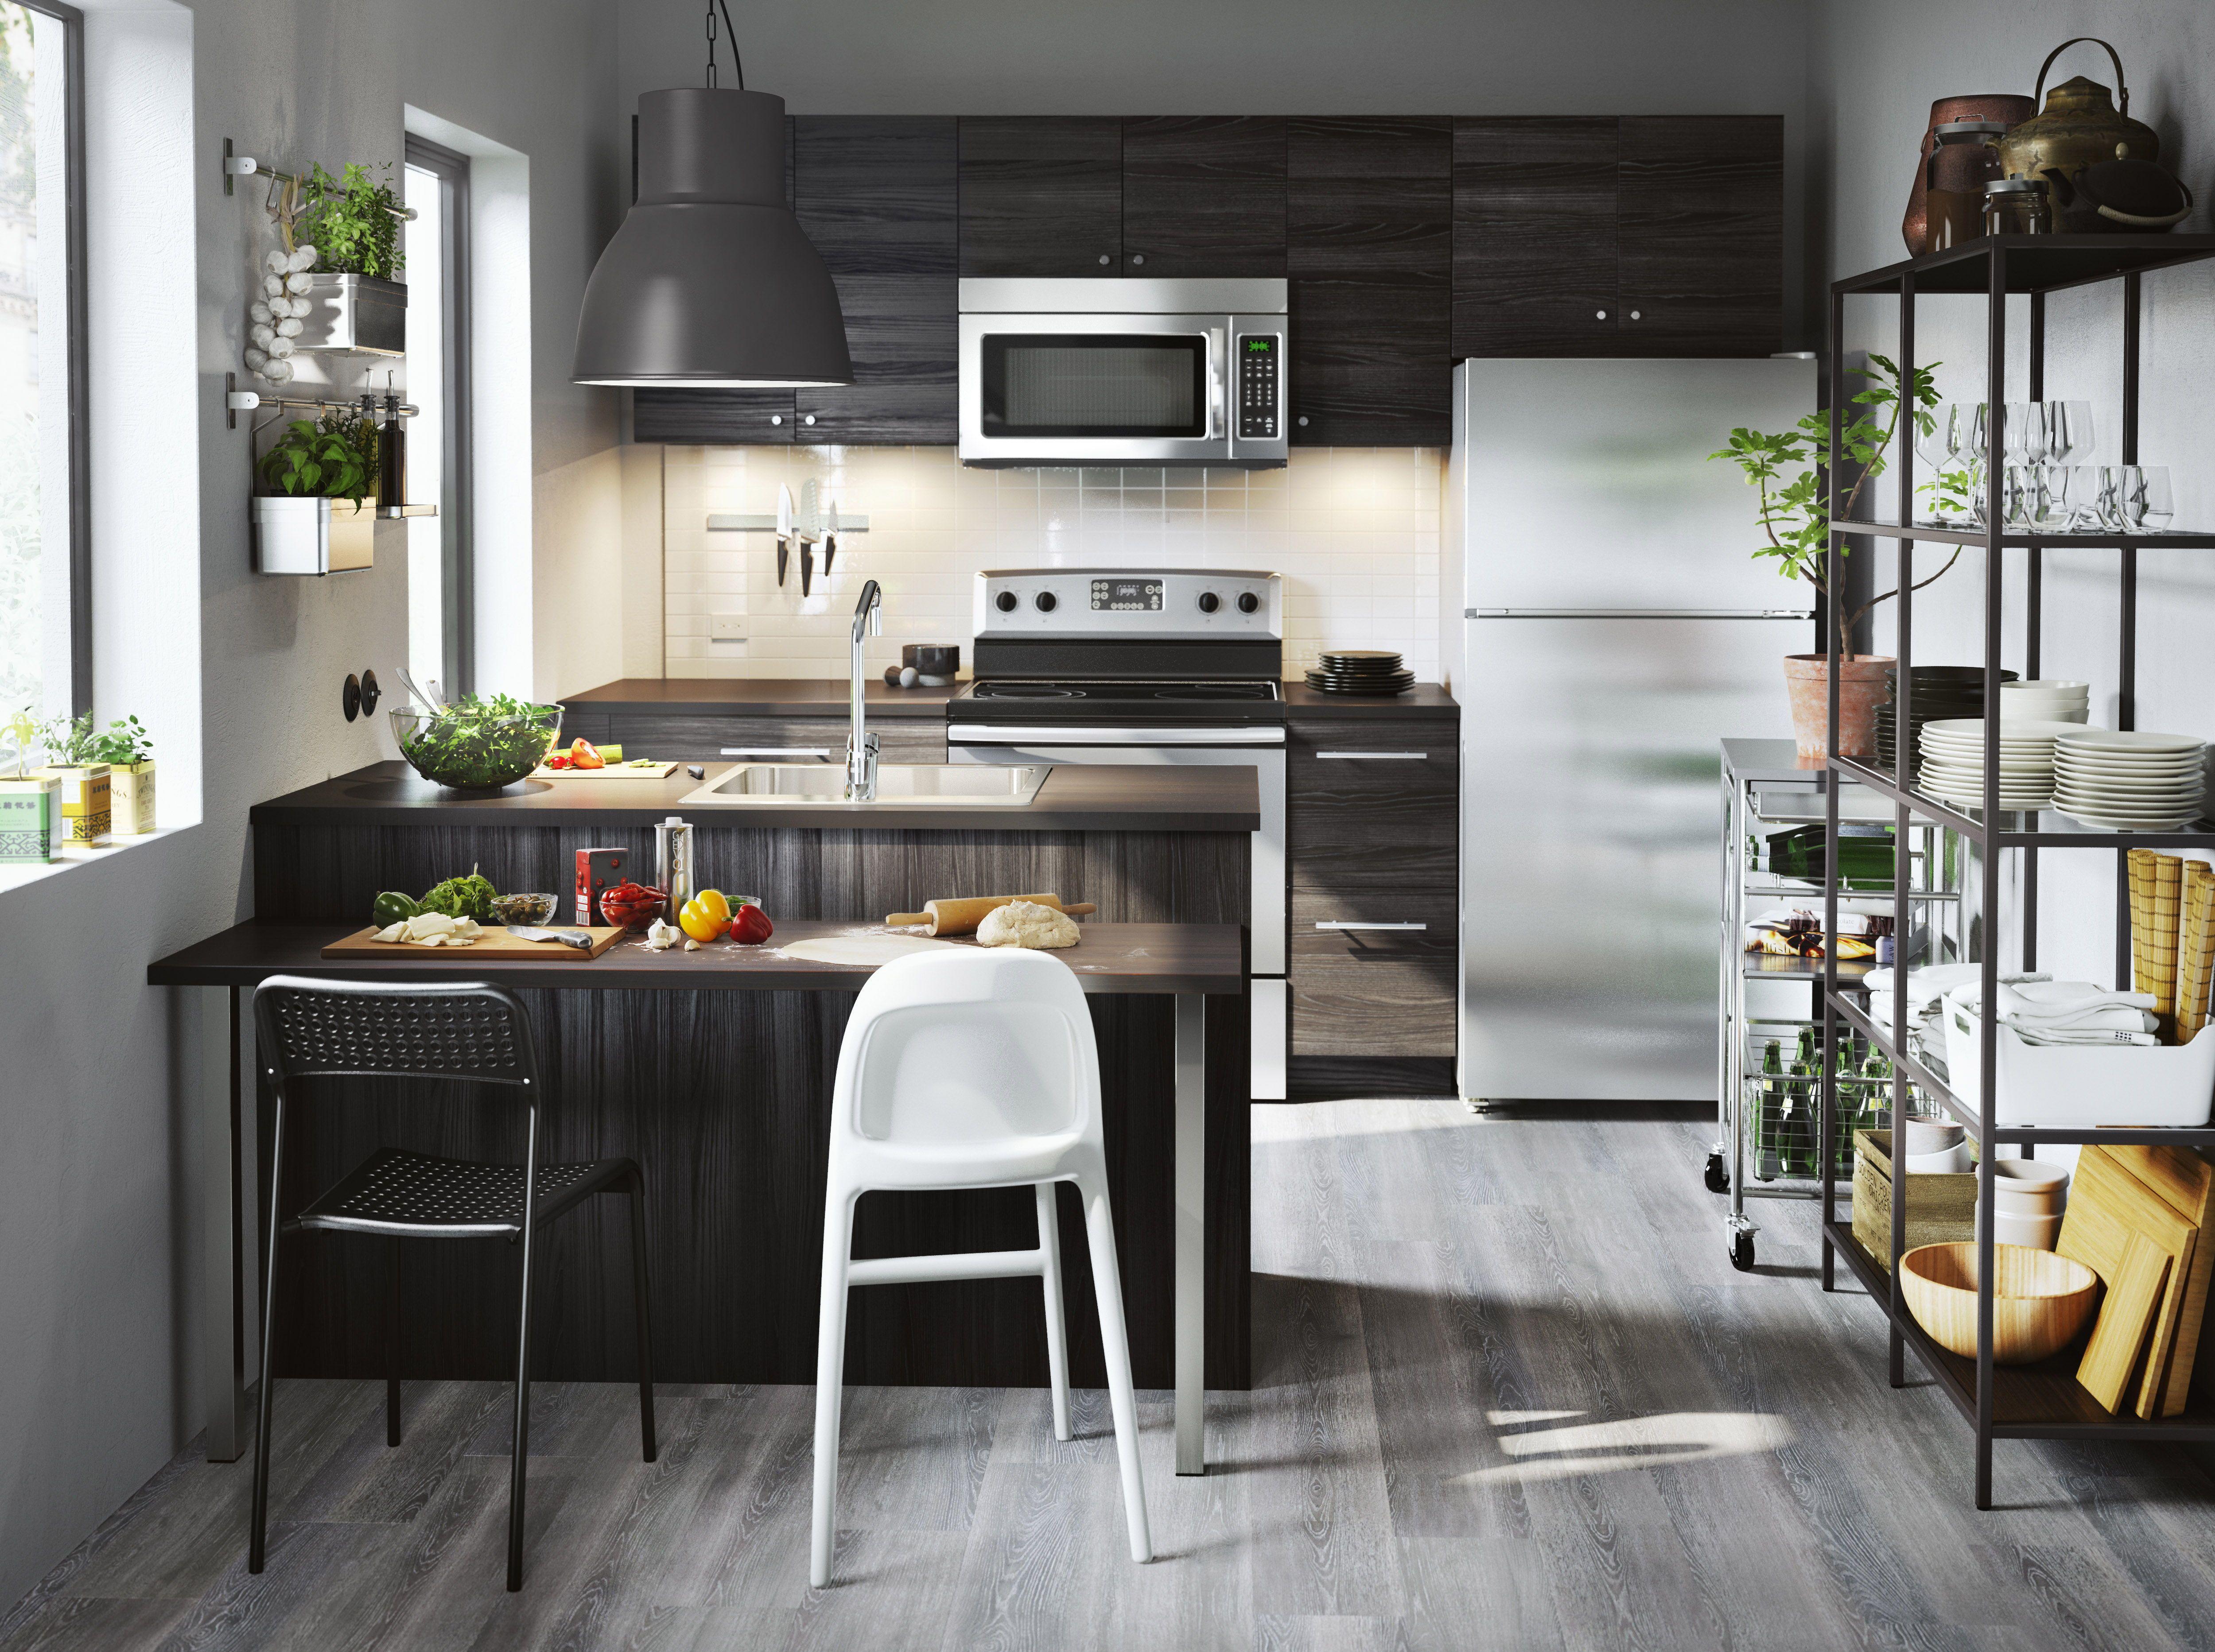 Keuken Ikea Open : Tingsryd deur houteffect zwart keukens kitchen ikea kitchen